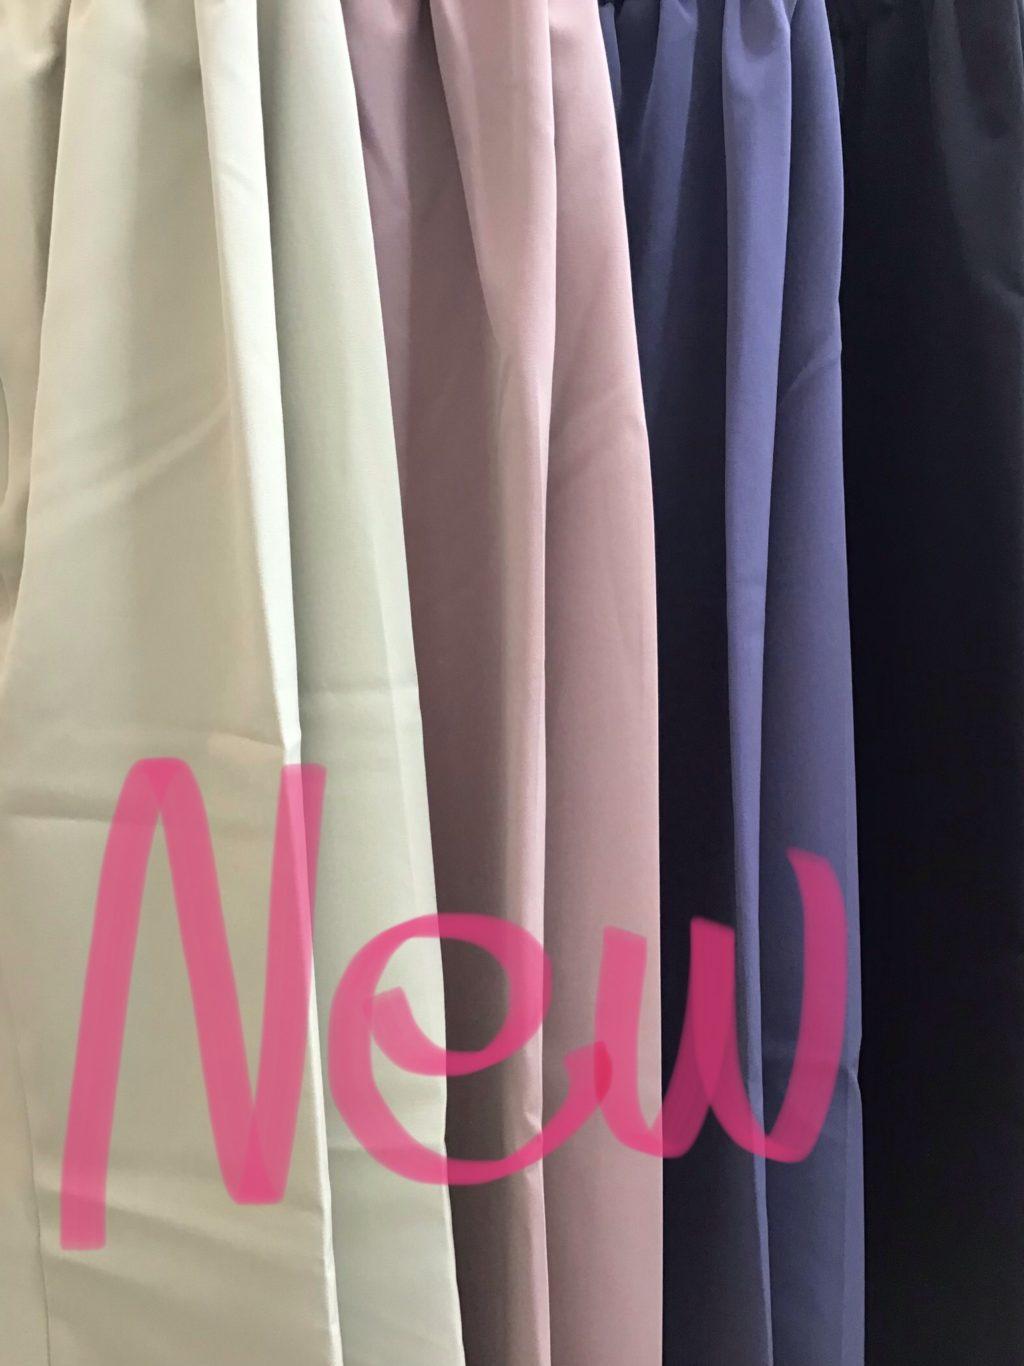 ✳︎Women's New Item✳︎